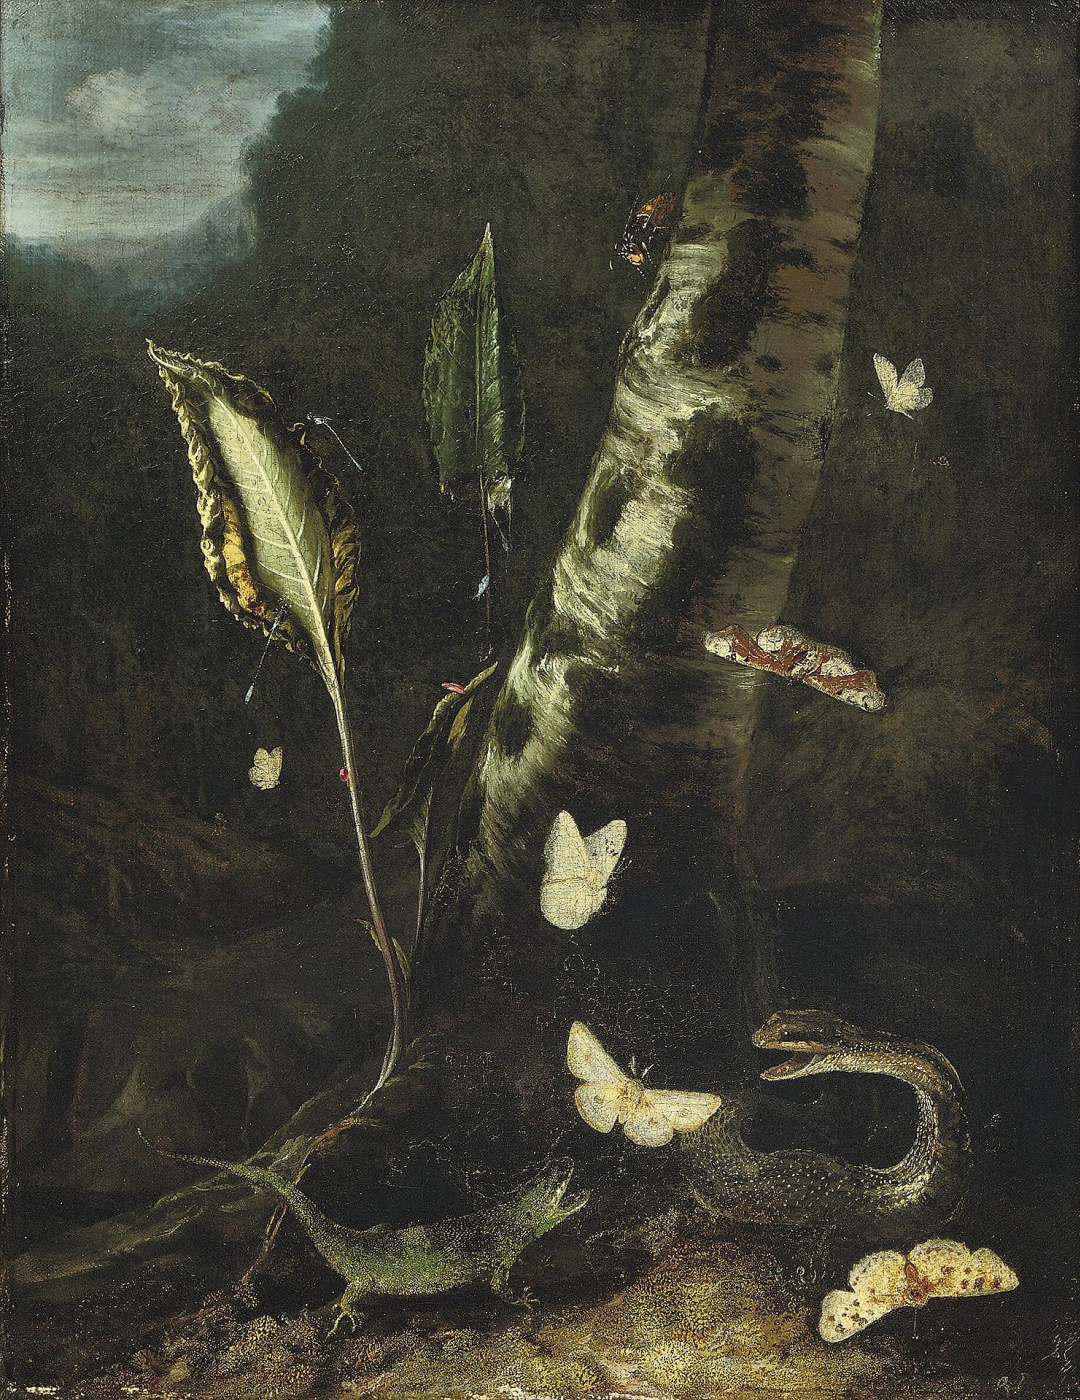 Otto Marceus van Scriec. Forest still life with a lizard, a snake and butterflies